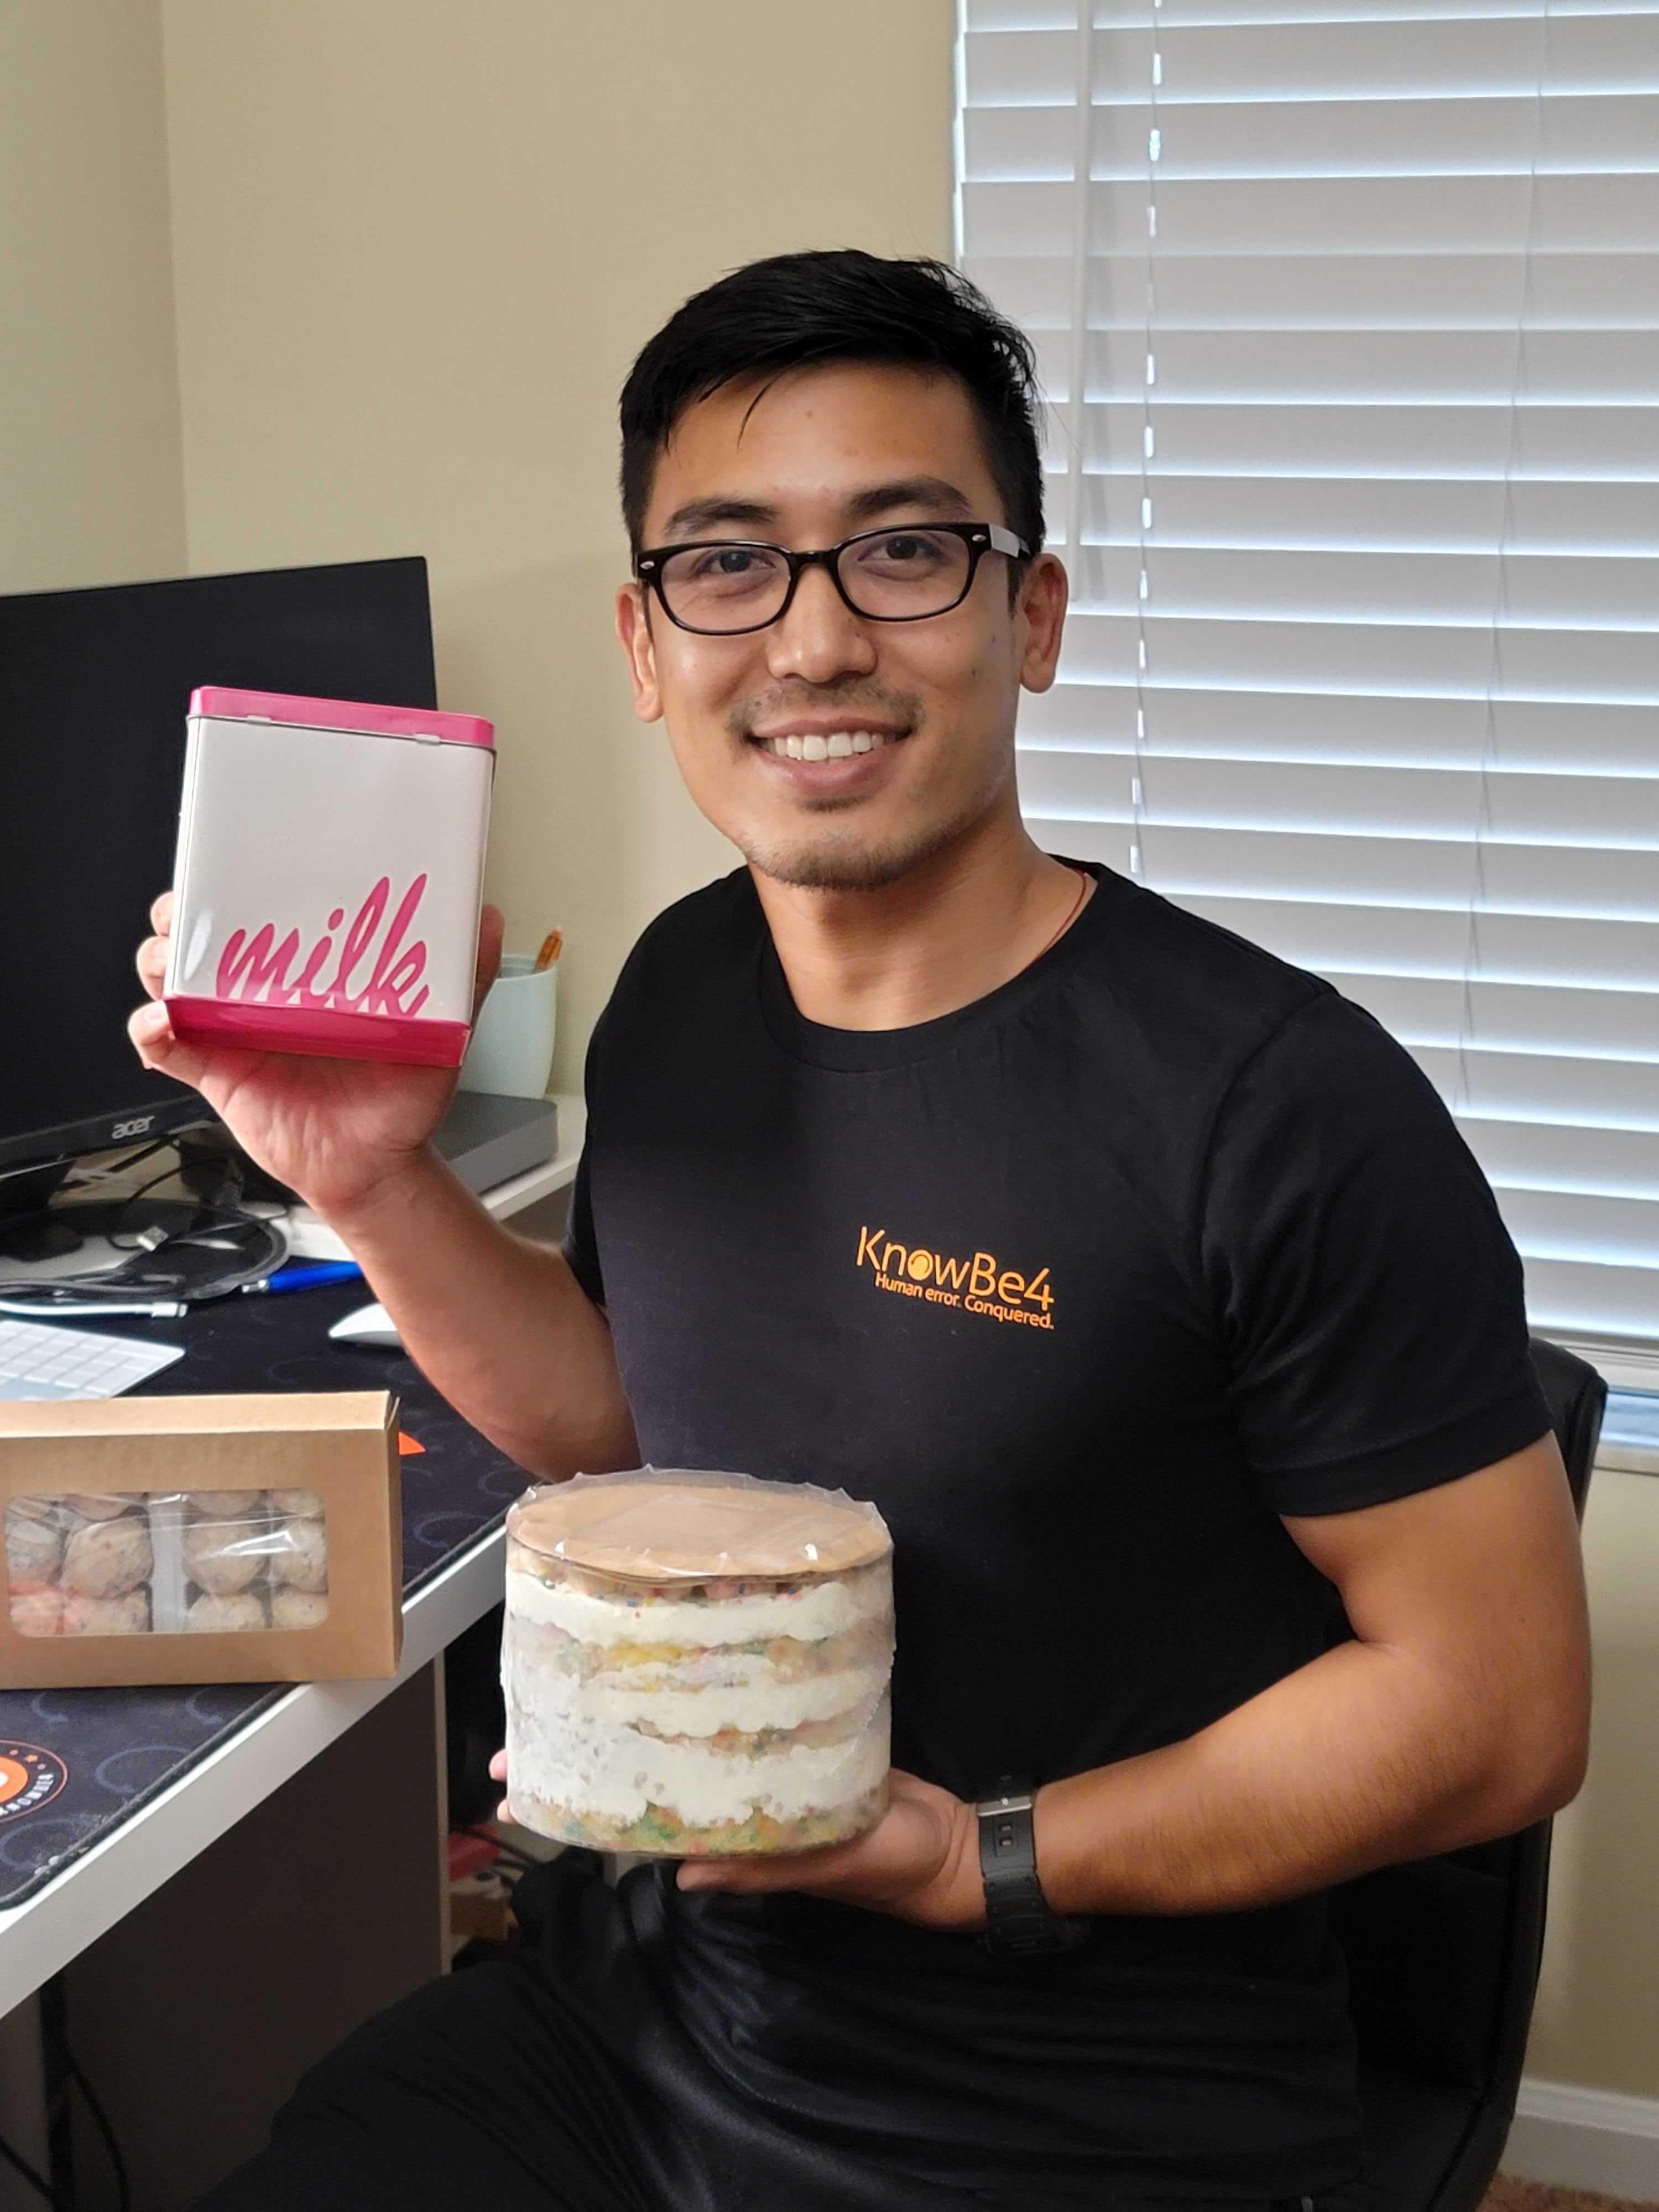 Interns received Milk Bar cakes